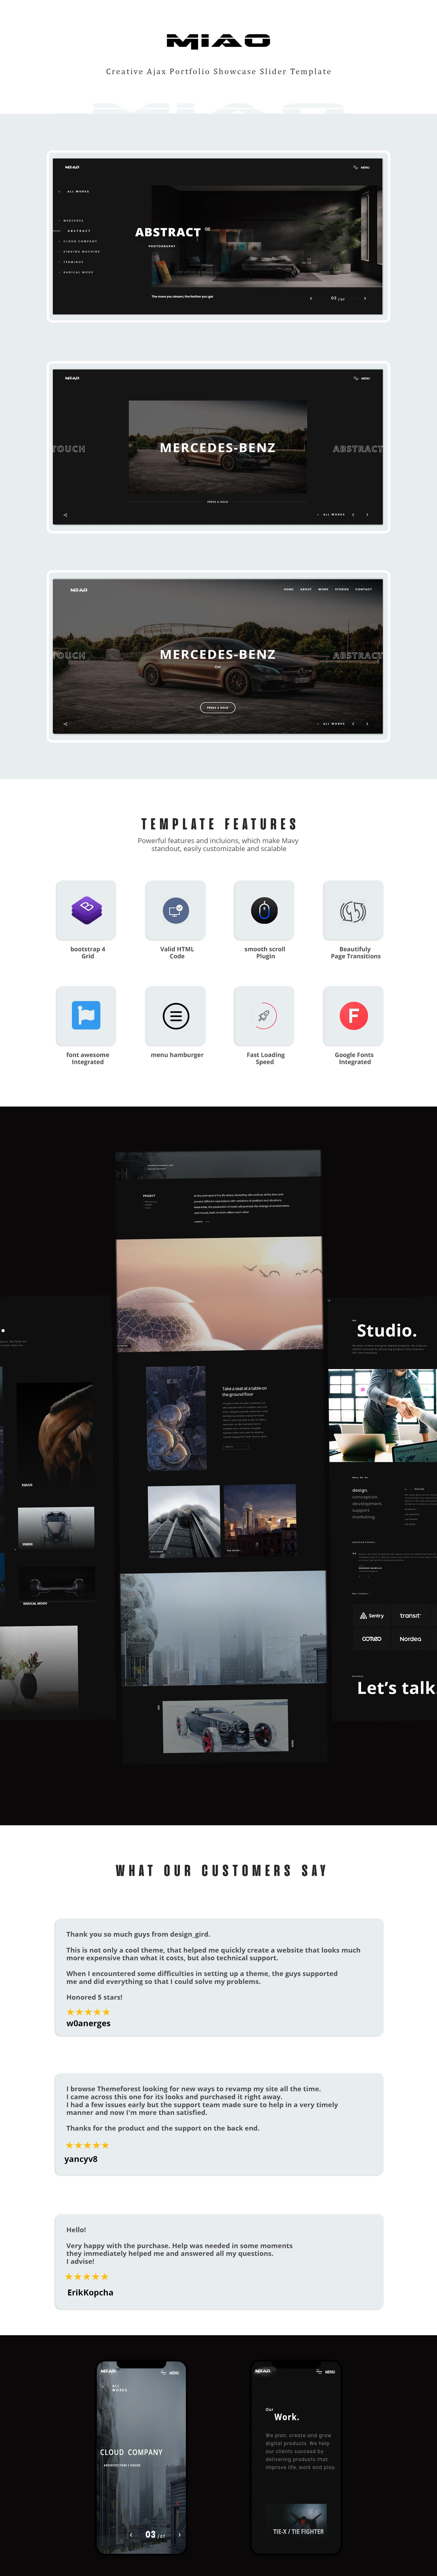 Miao - Ajax Portfolio Showcase HTML Template - 1